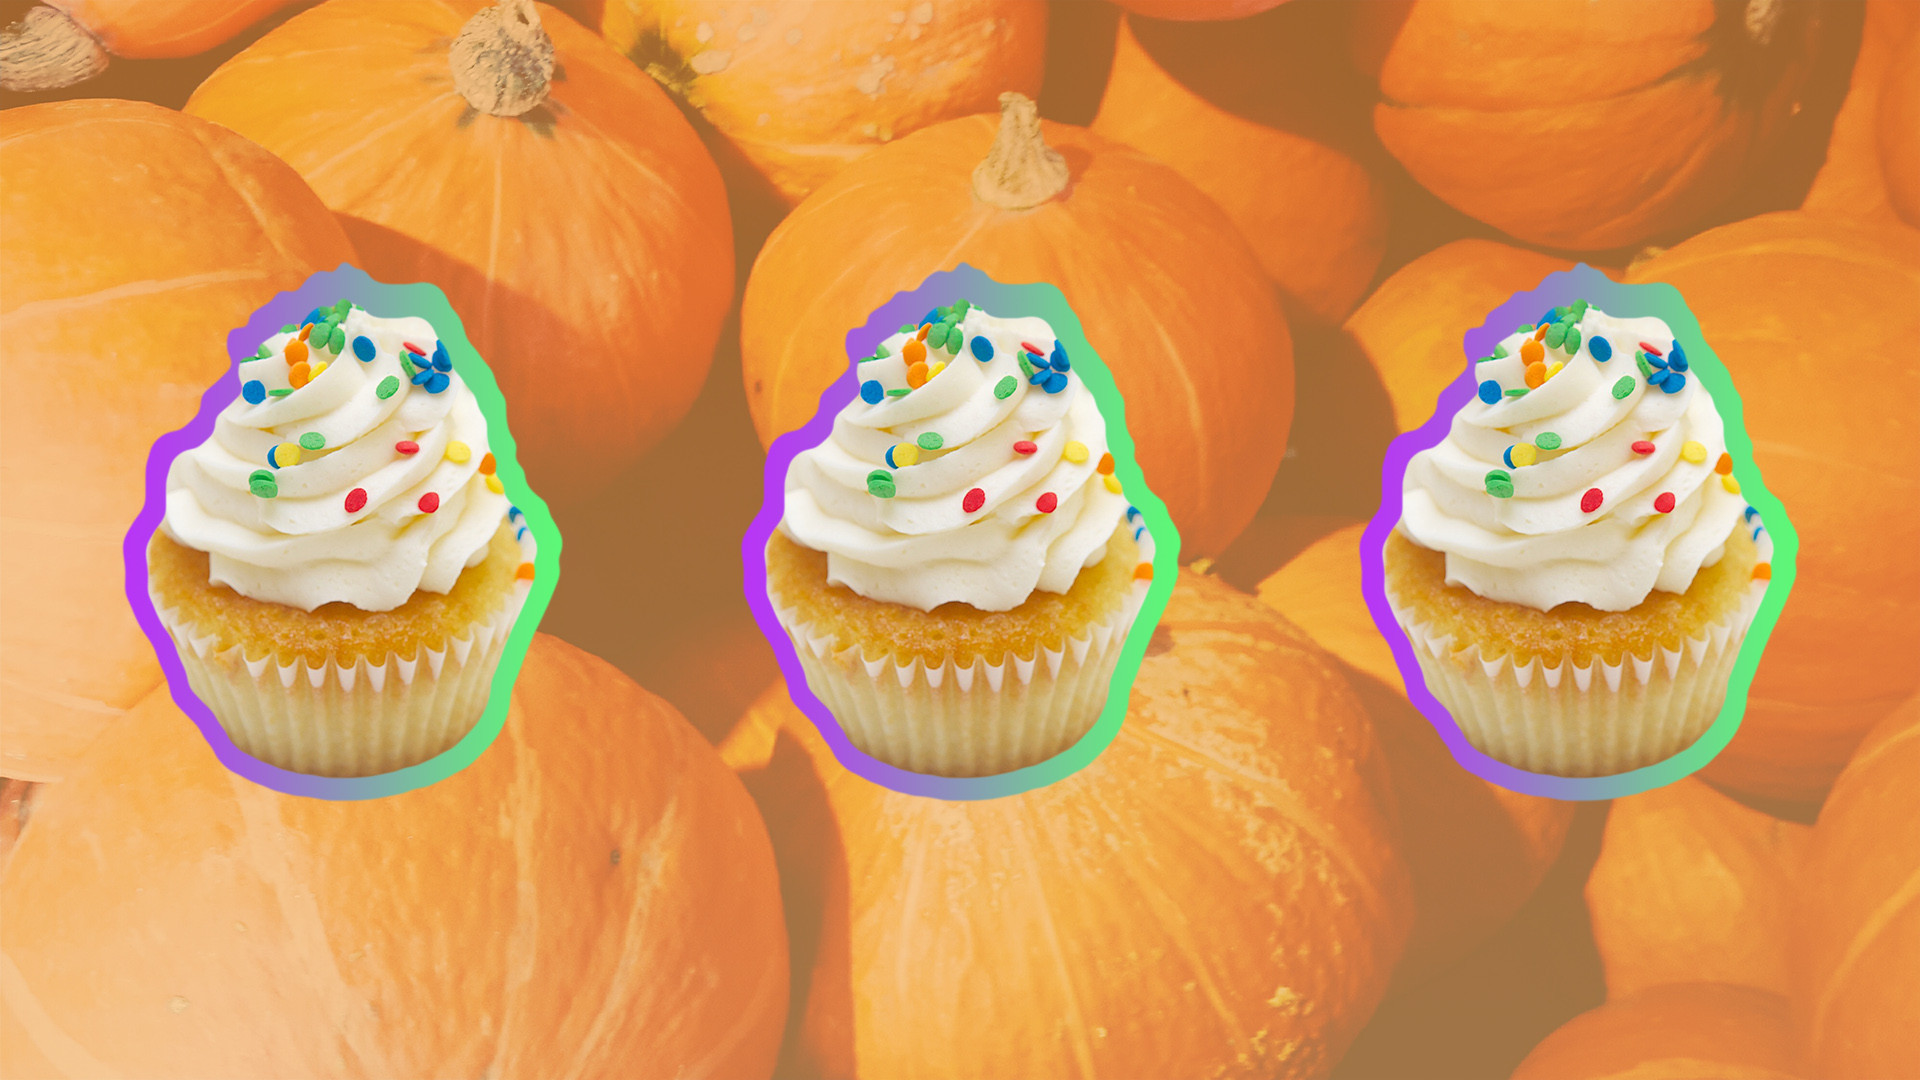 Pinterest Halloween Desserts  The Greatest Halloween Desserts Trending on Pinterest